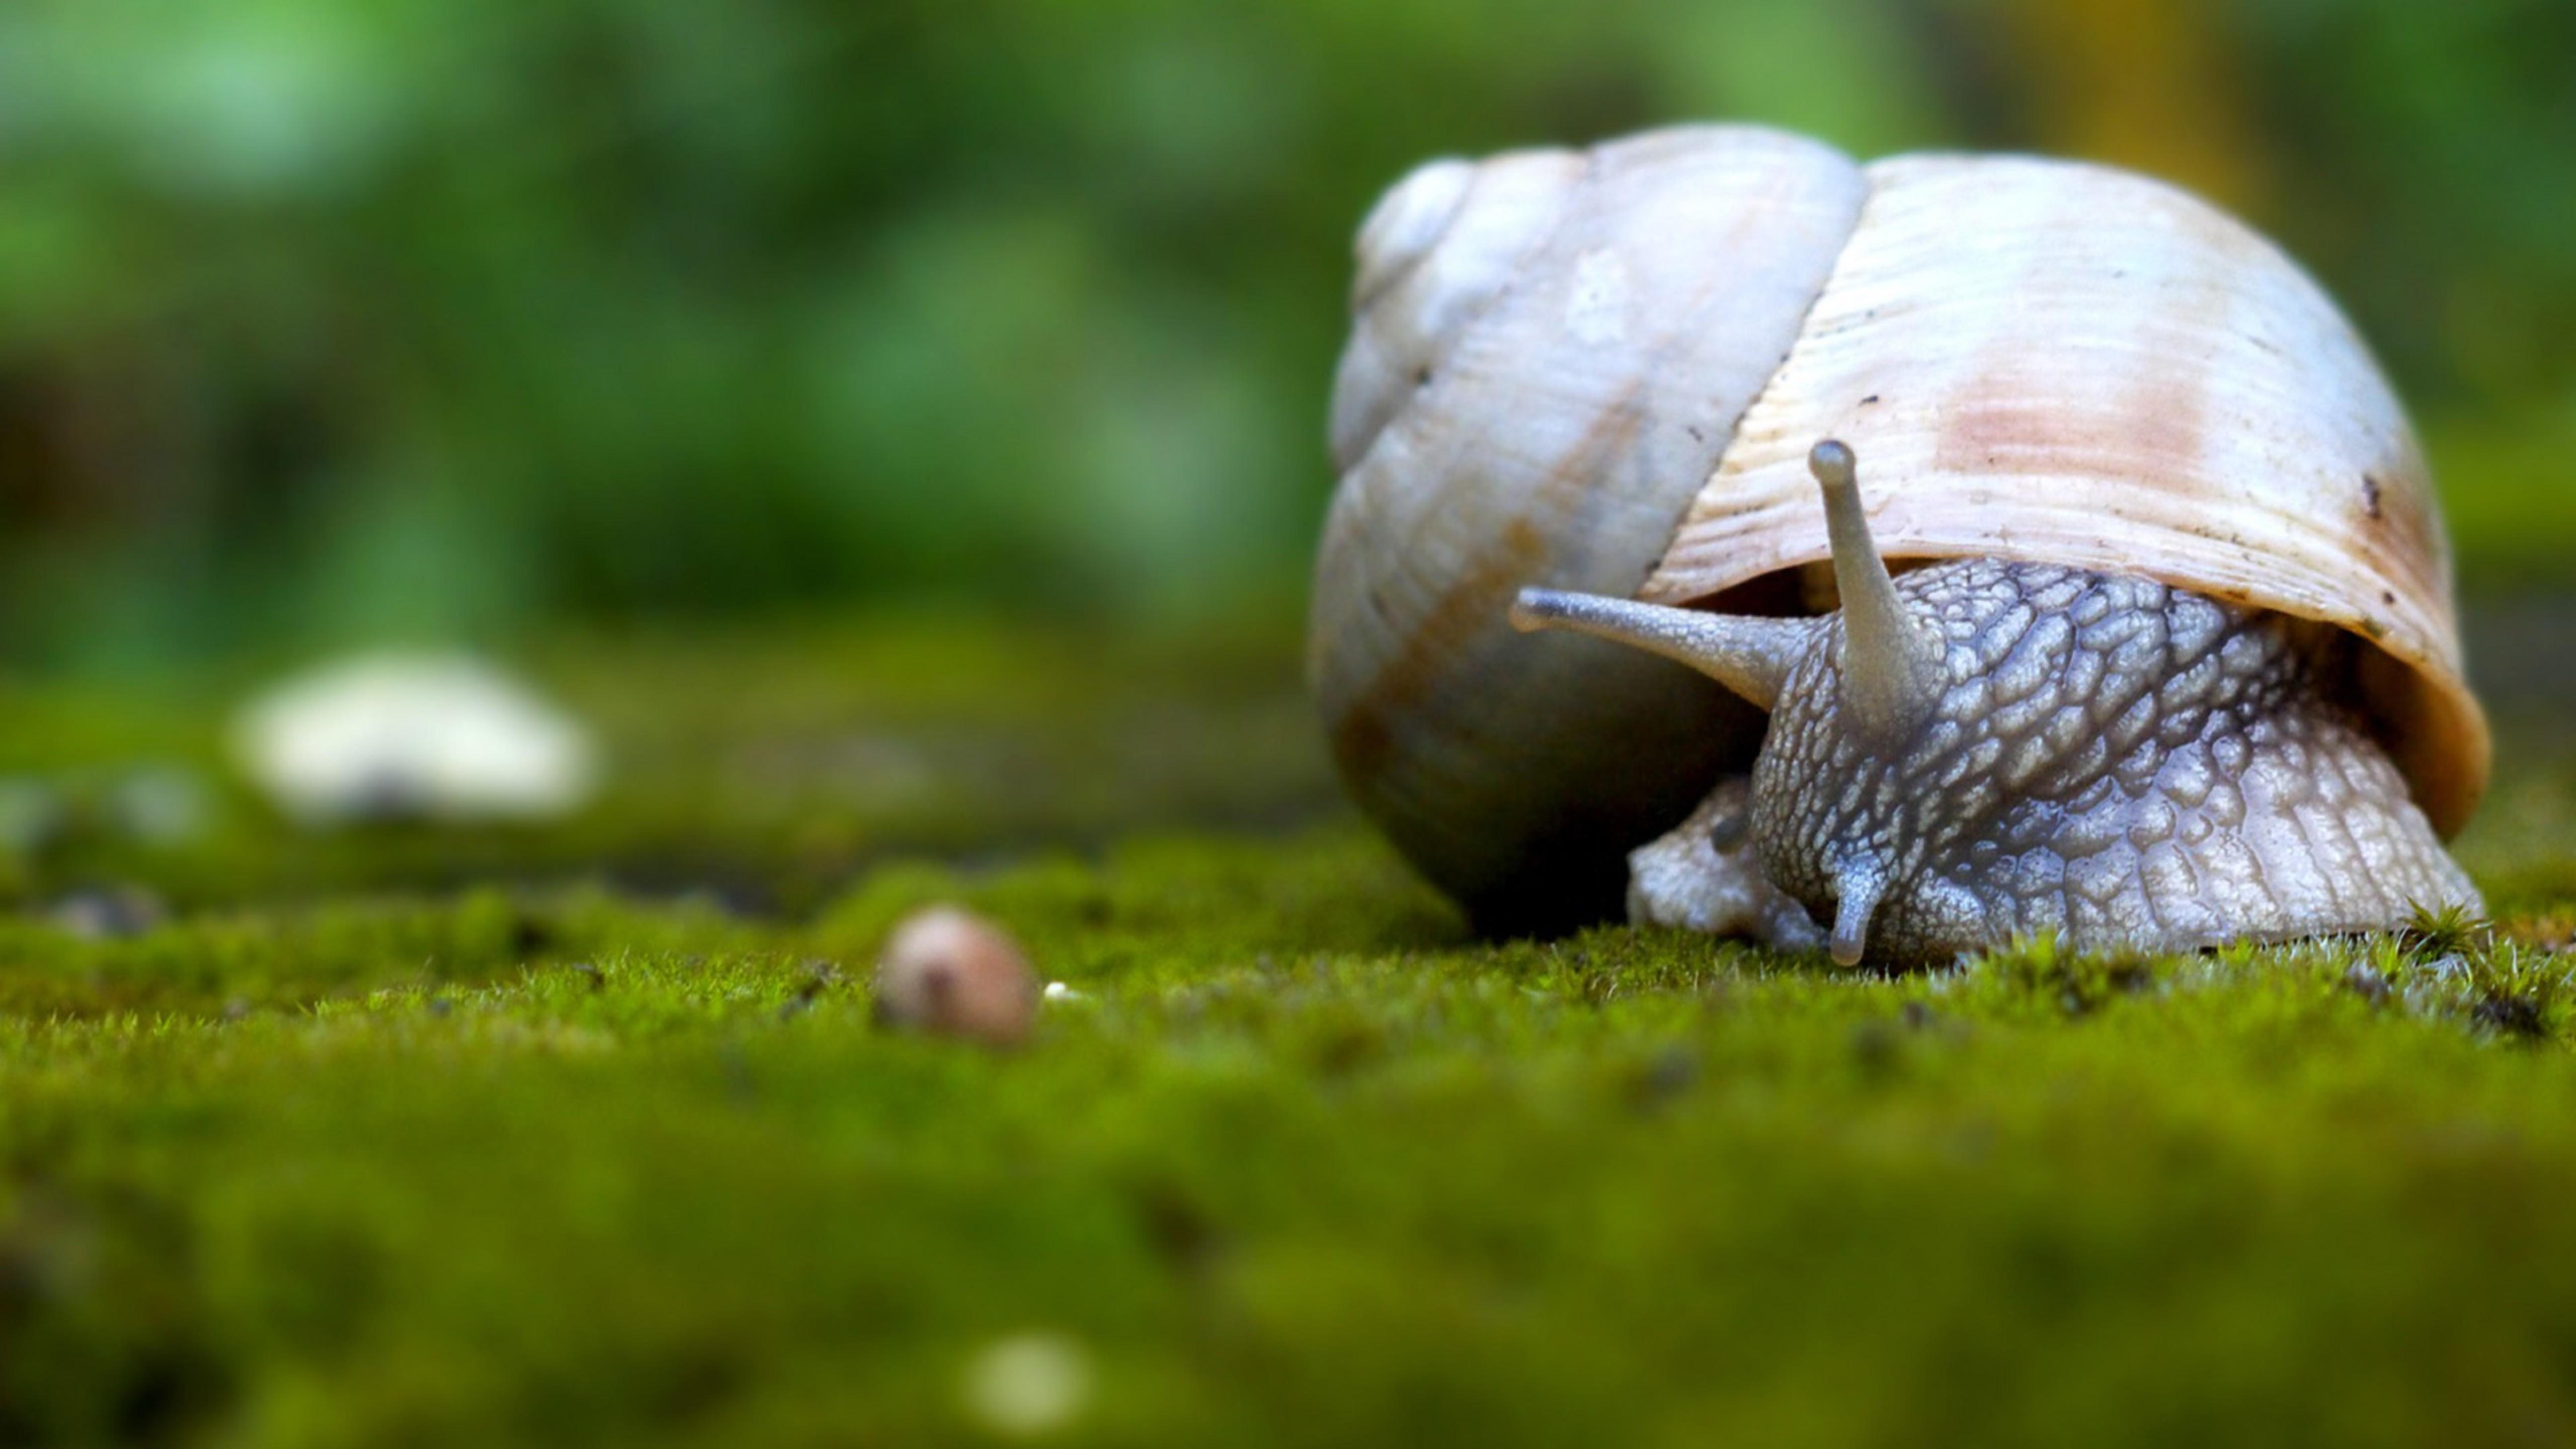 Snail walking on grass Wallpaper Download 5120x2880